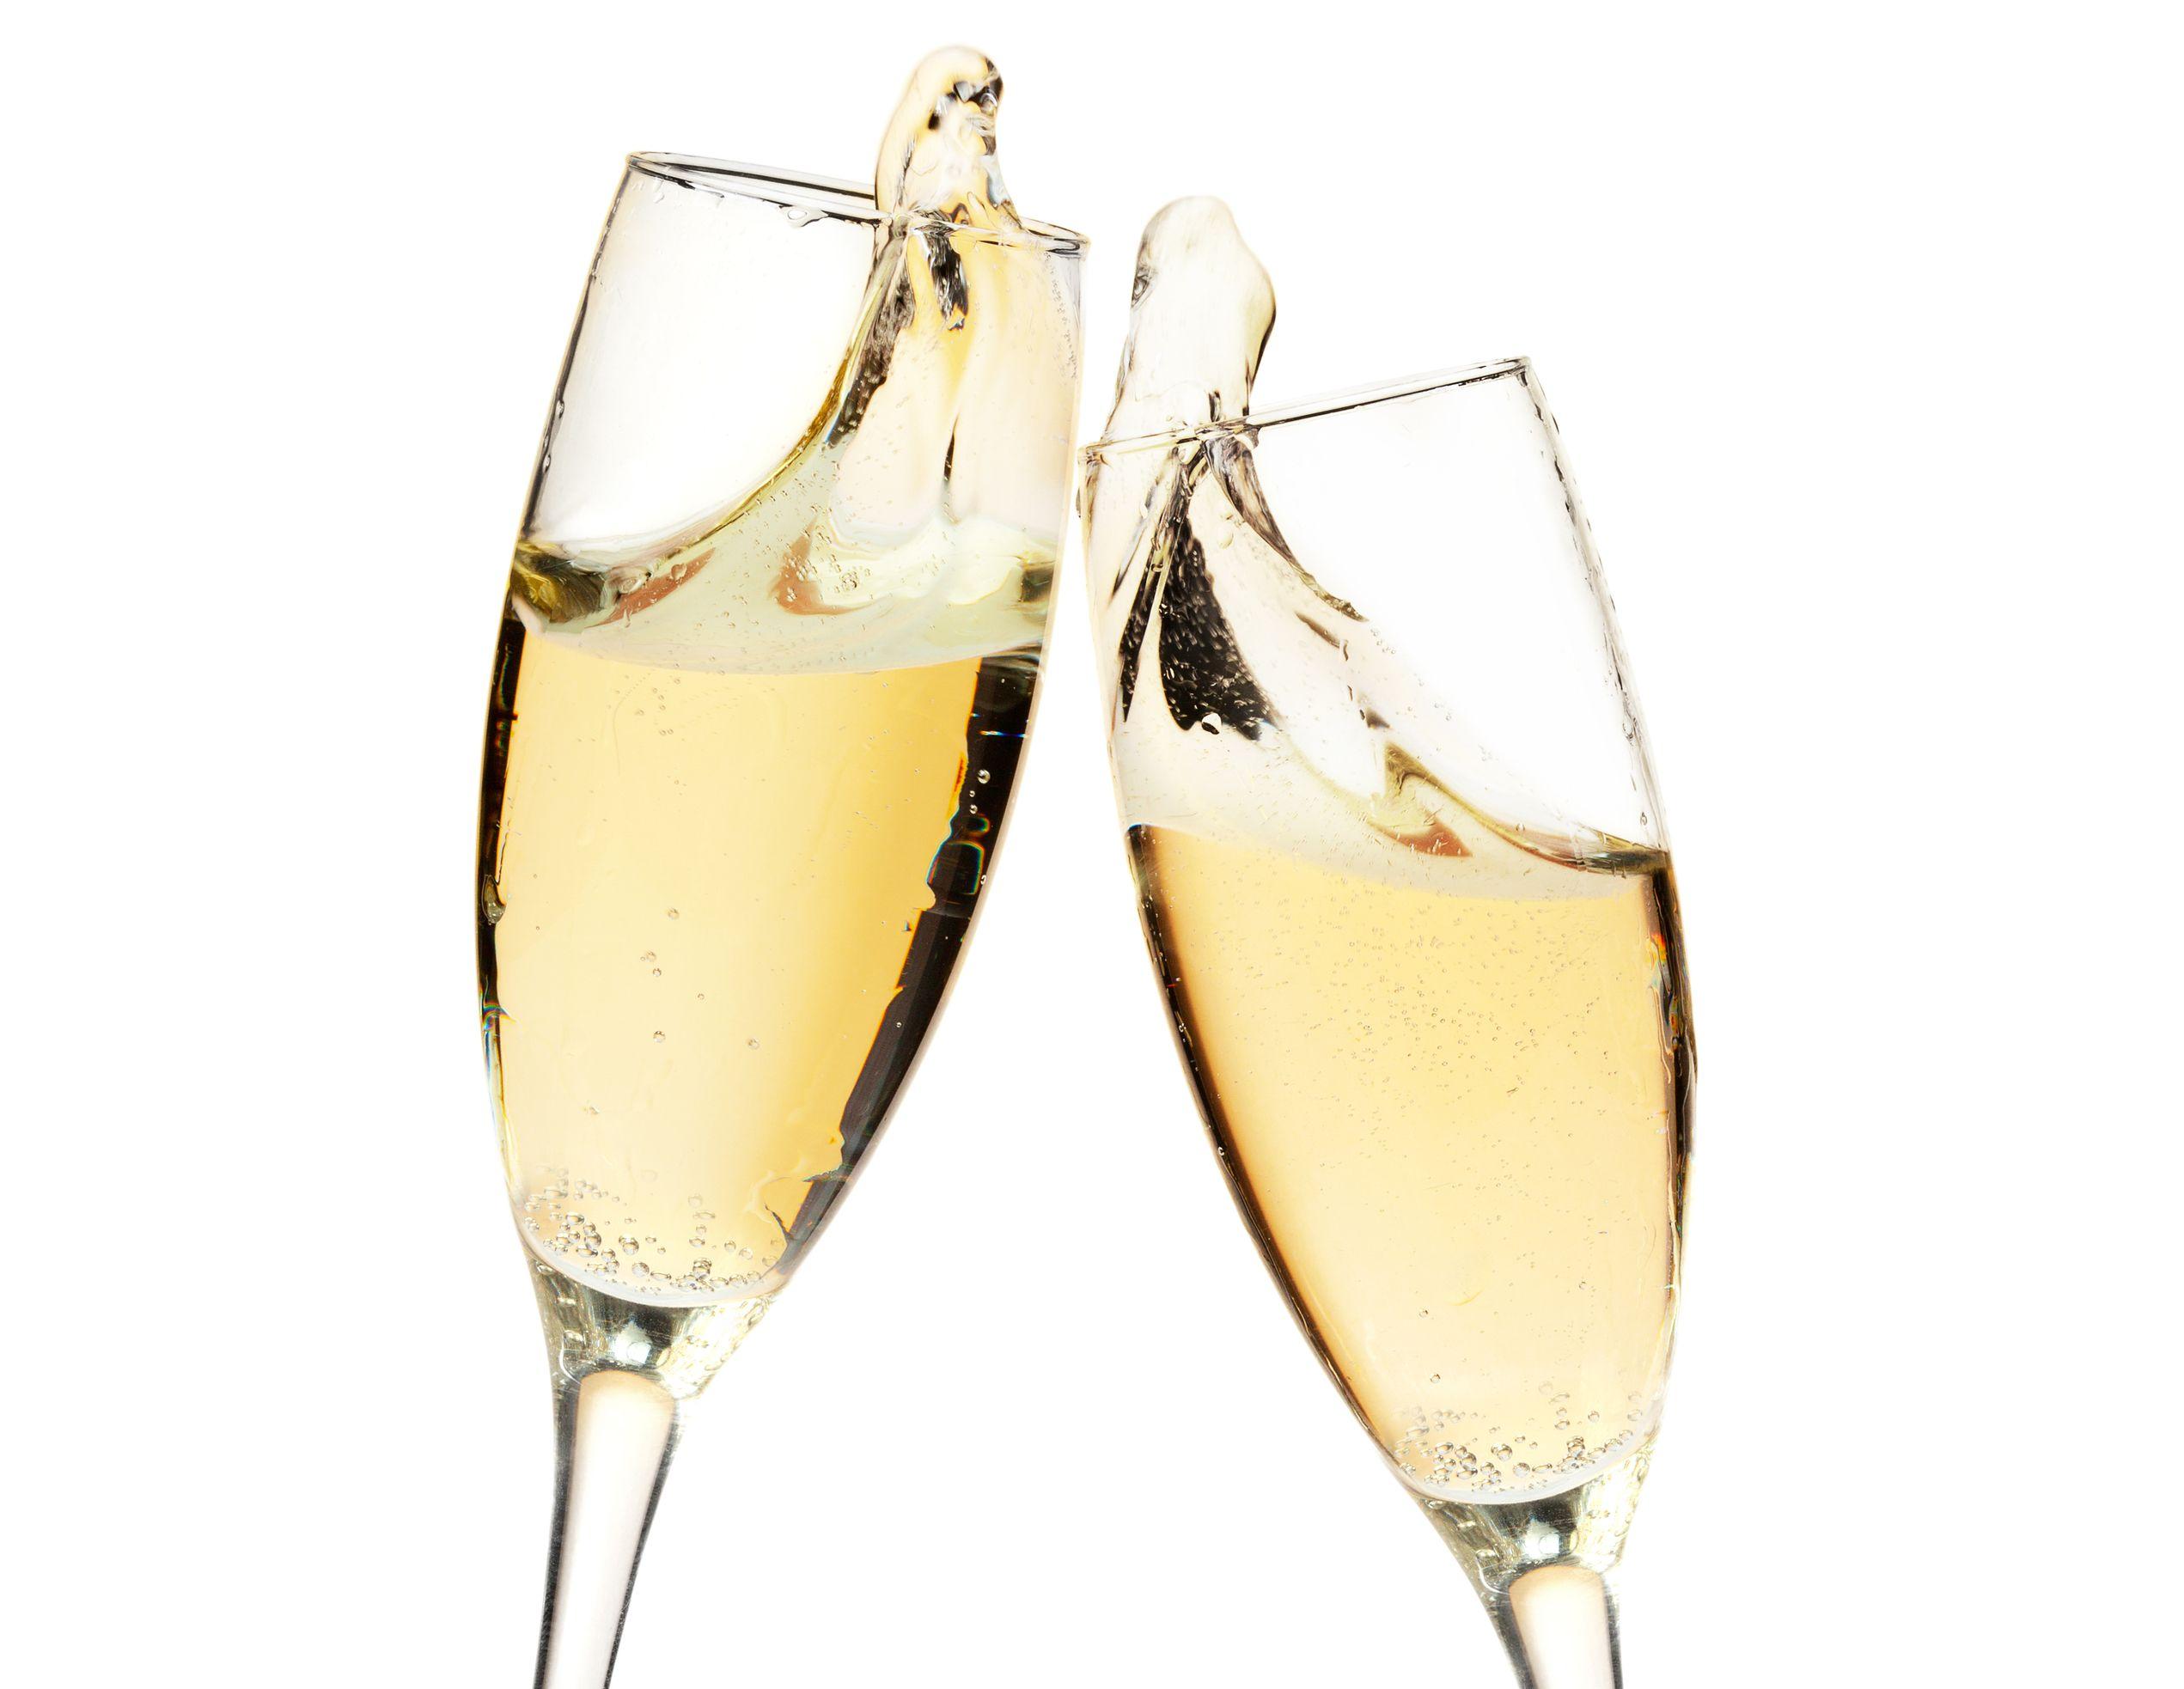 Champagne Jpg 2542 1966 Champagne Glasses Champagne Indie Artist